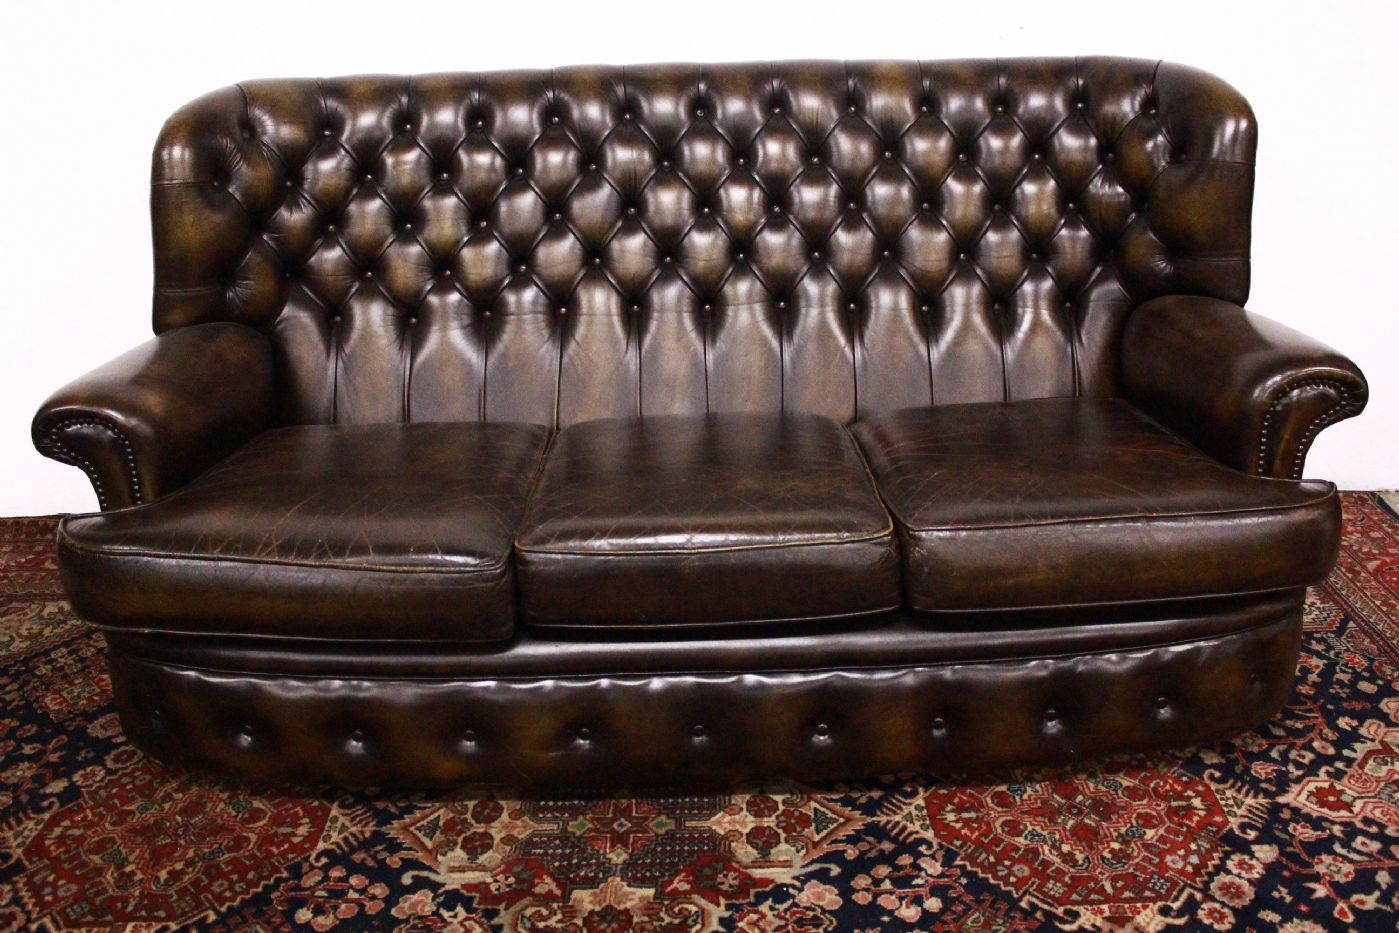 Divano Chester Originale Inglese In Pelle.Original Chesterfield Sofa 3 Seats Dark Skin Mustard English